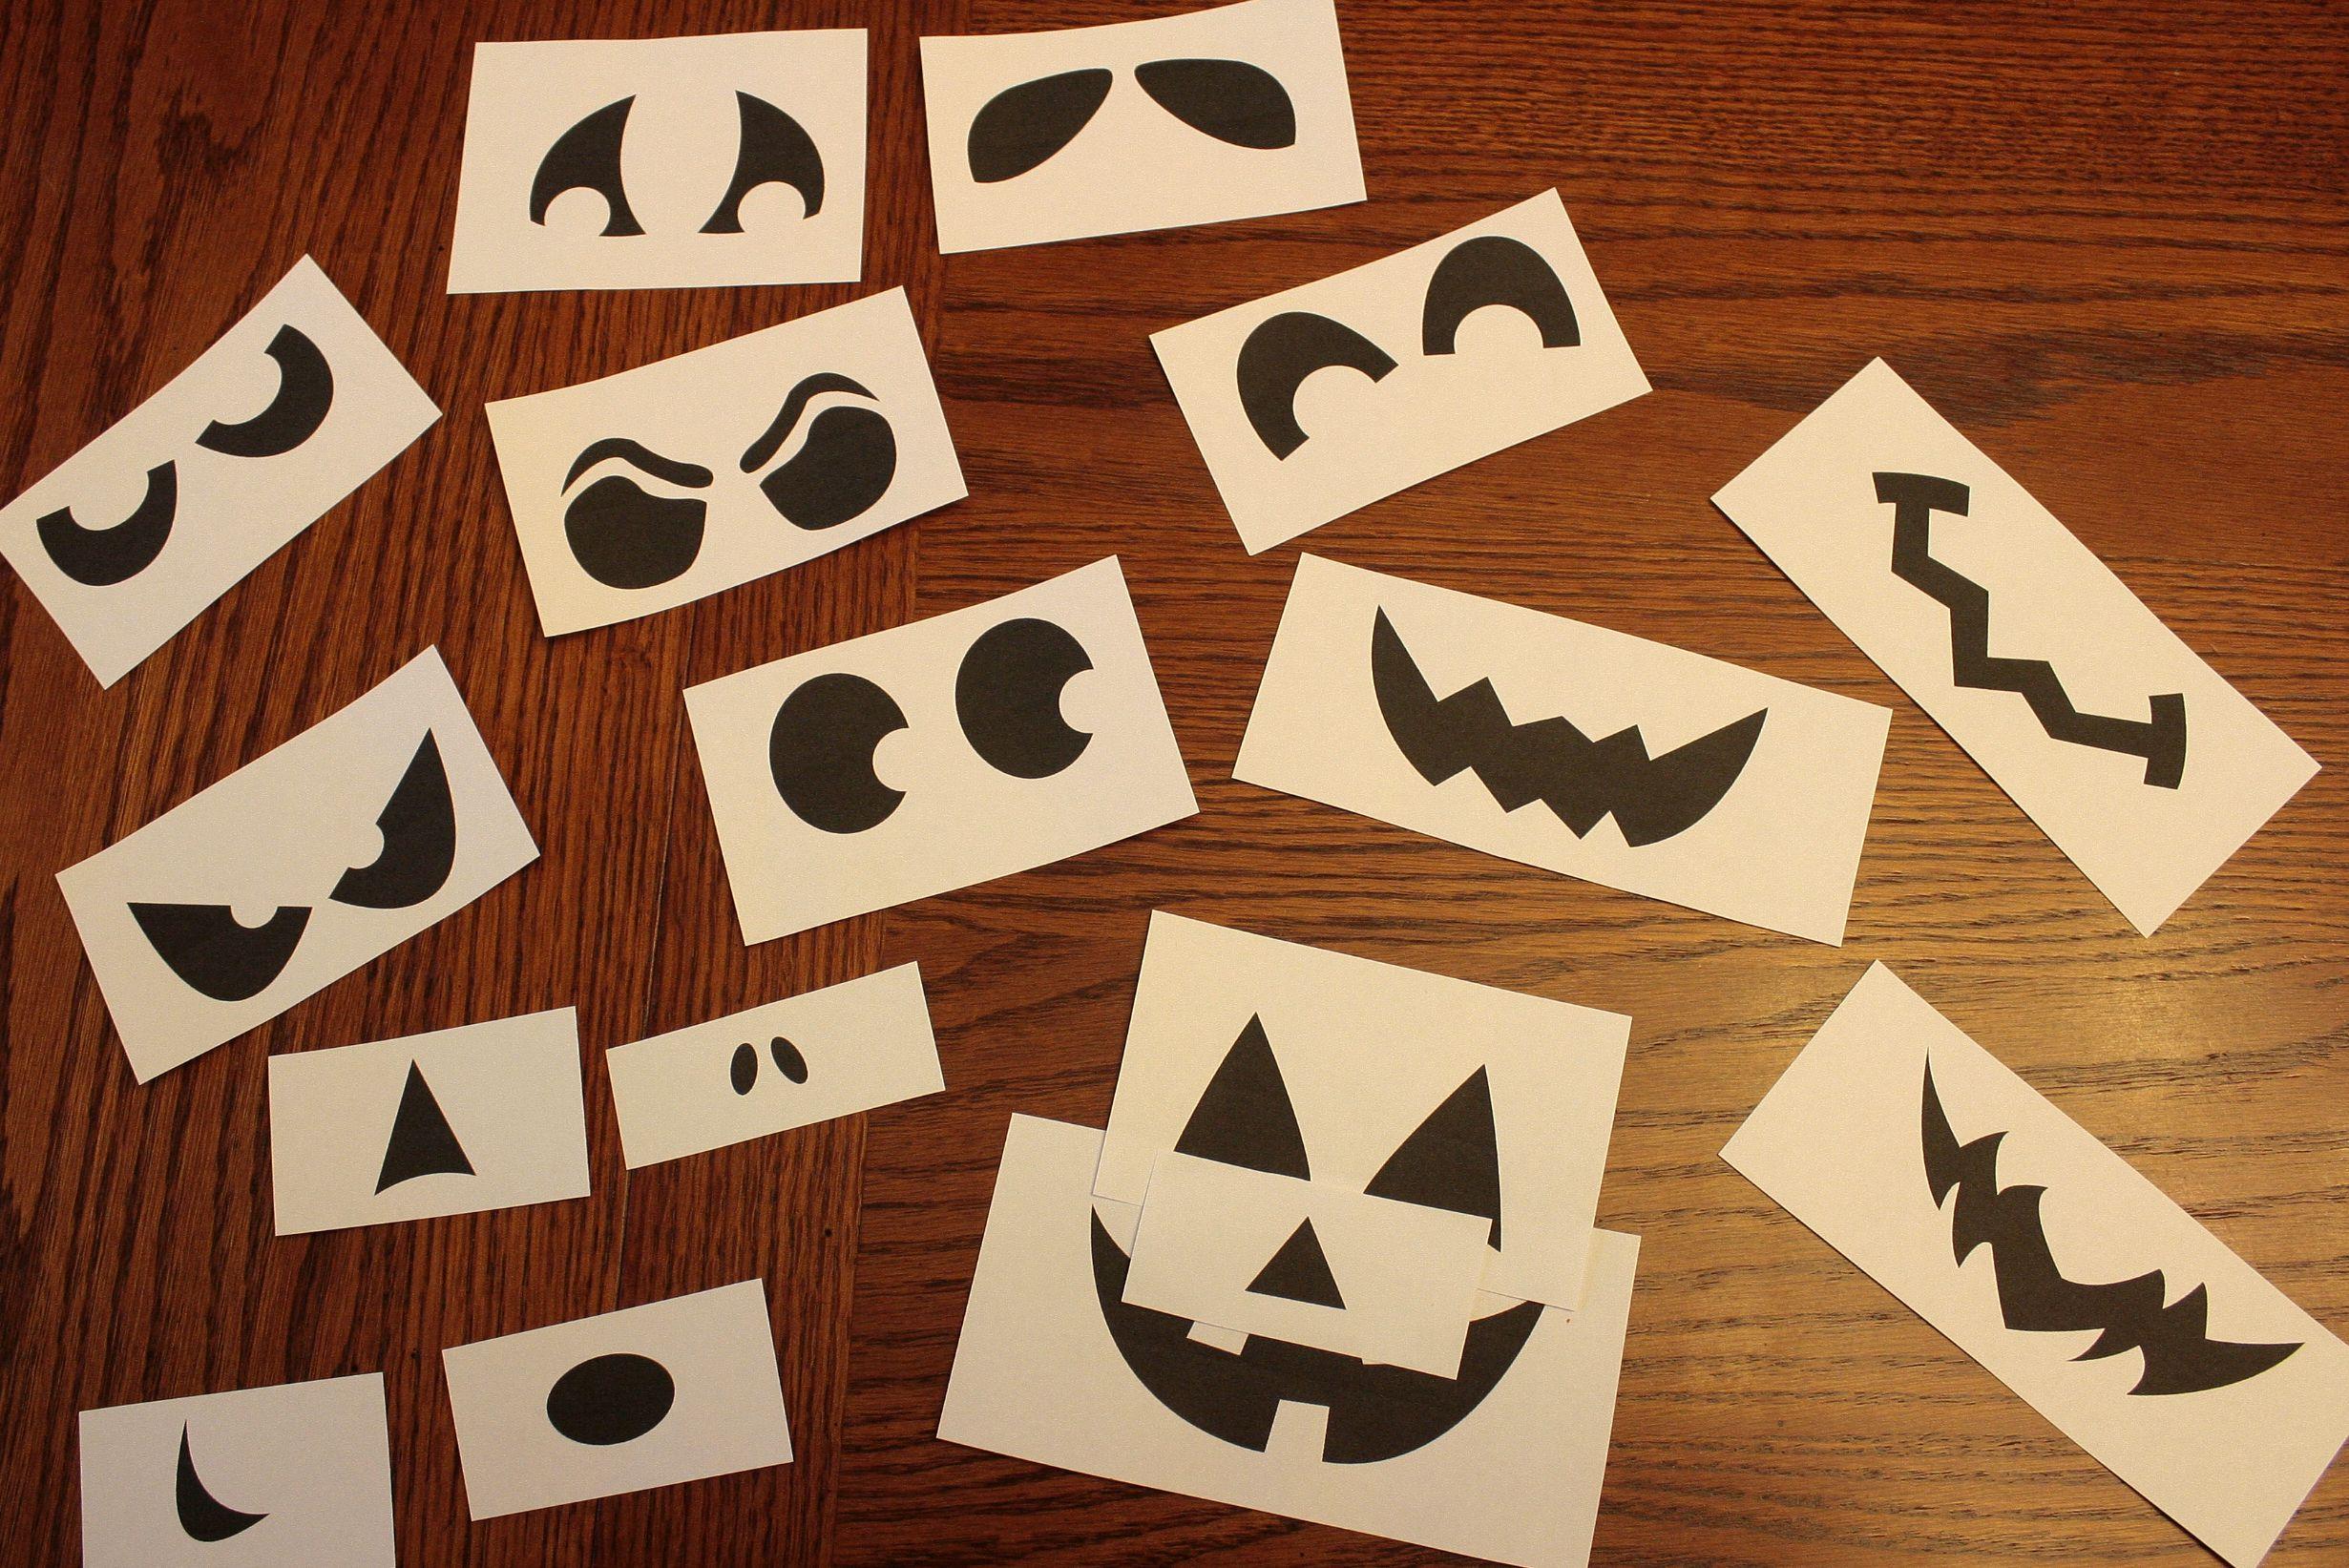 Templates For Jack O Lantern Faces